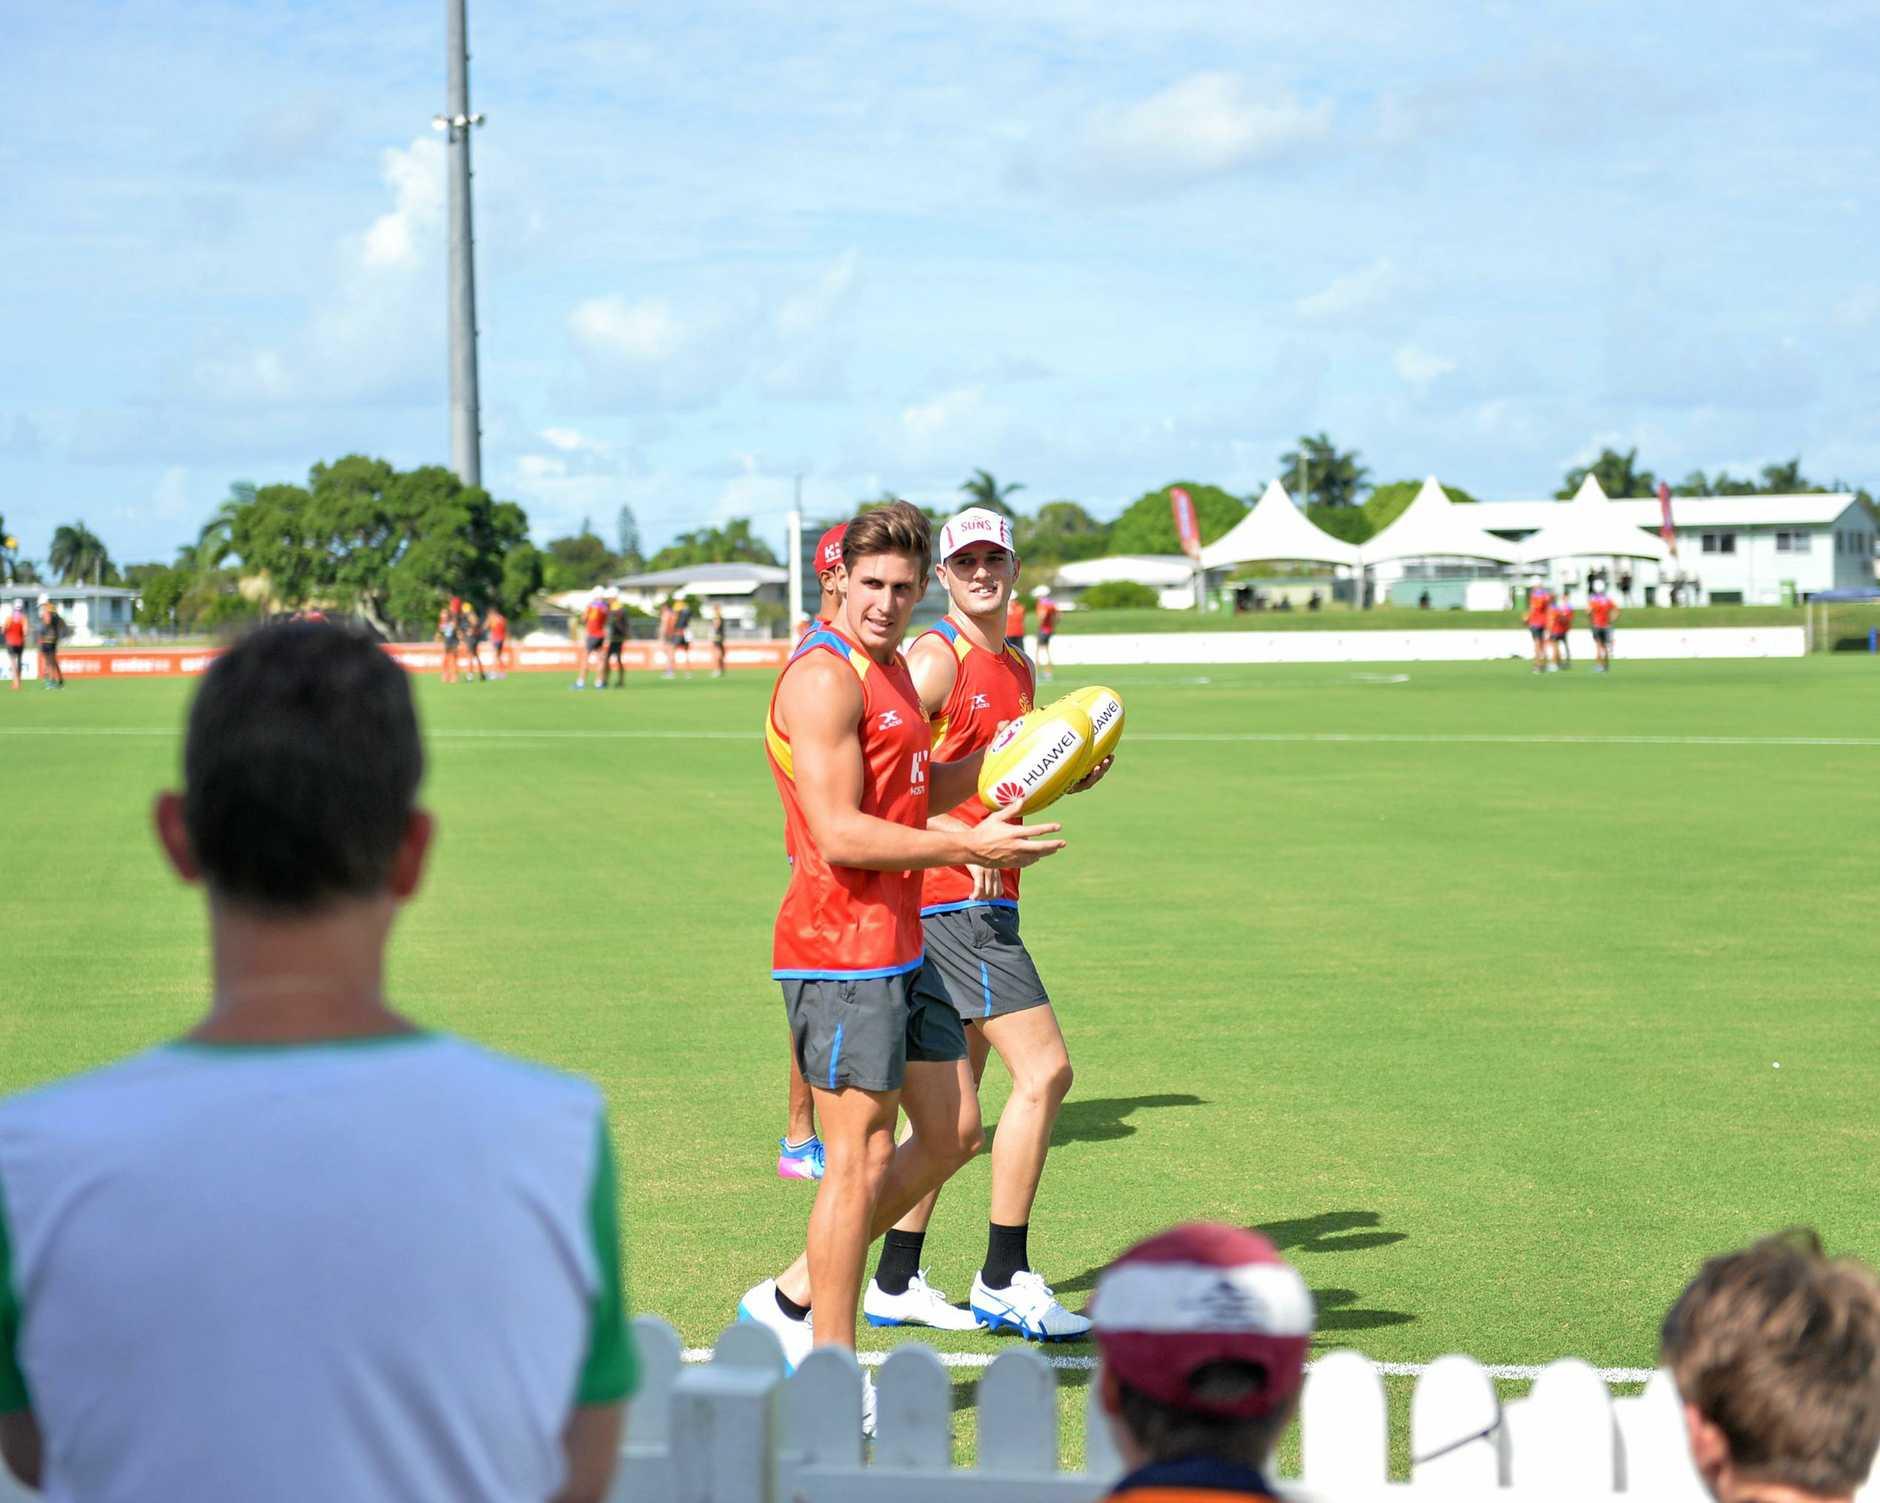 Gold Coast Sun's open training session at Harrup Park on Saturday, February 25, 2017.